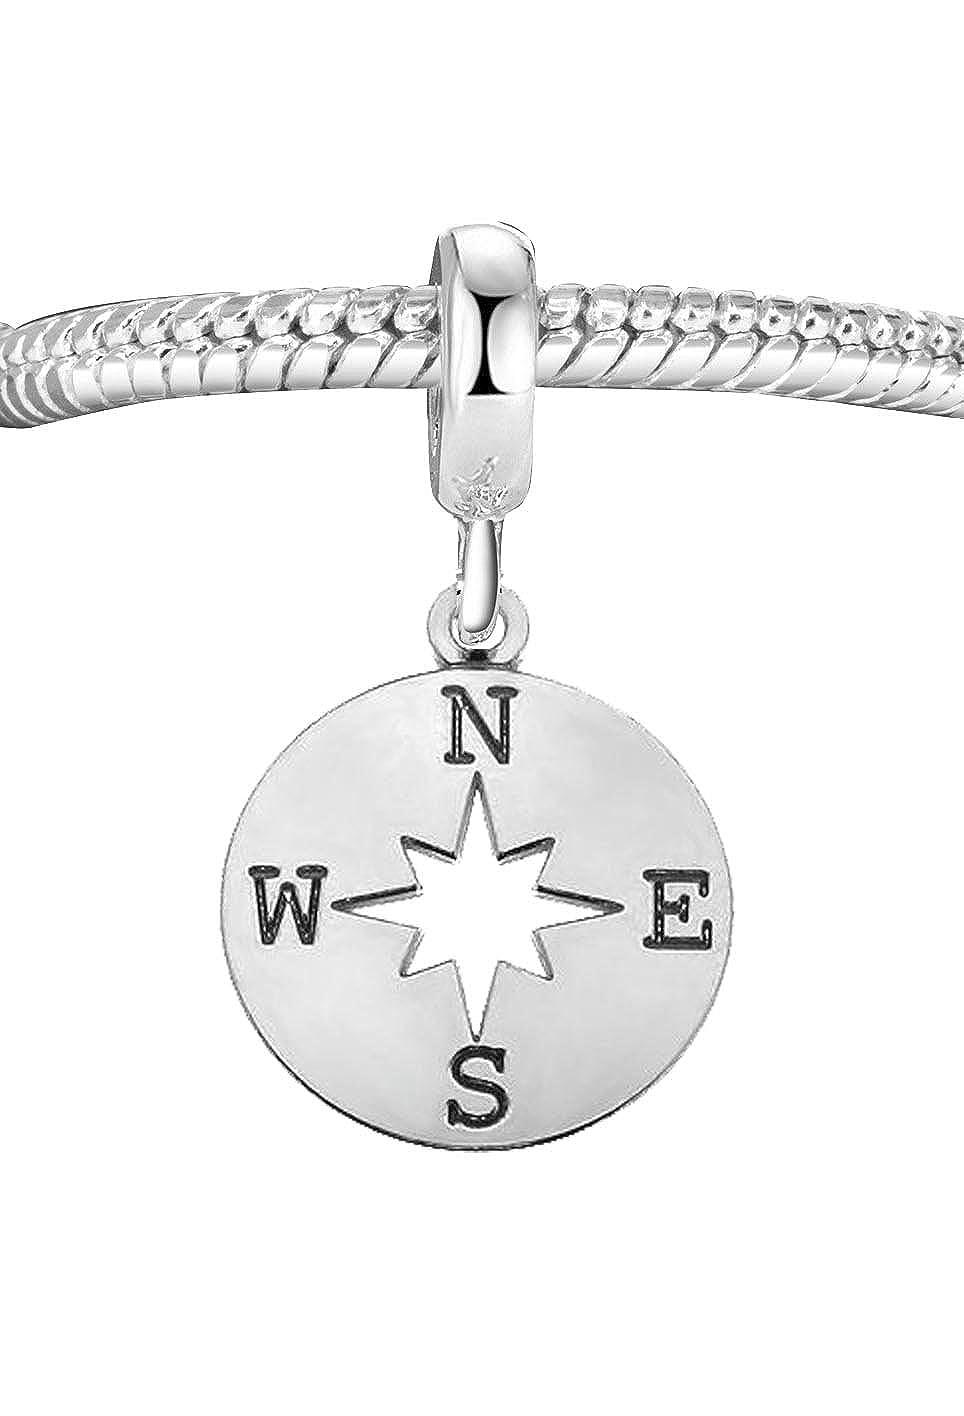 Véritable argent sterling 925Boussole Perle charm) Eurojewellery odl114b